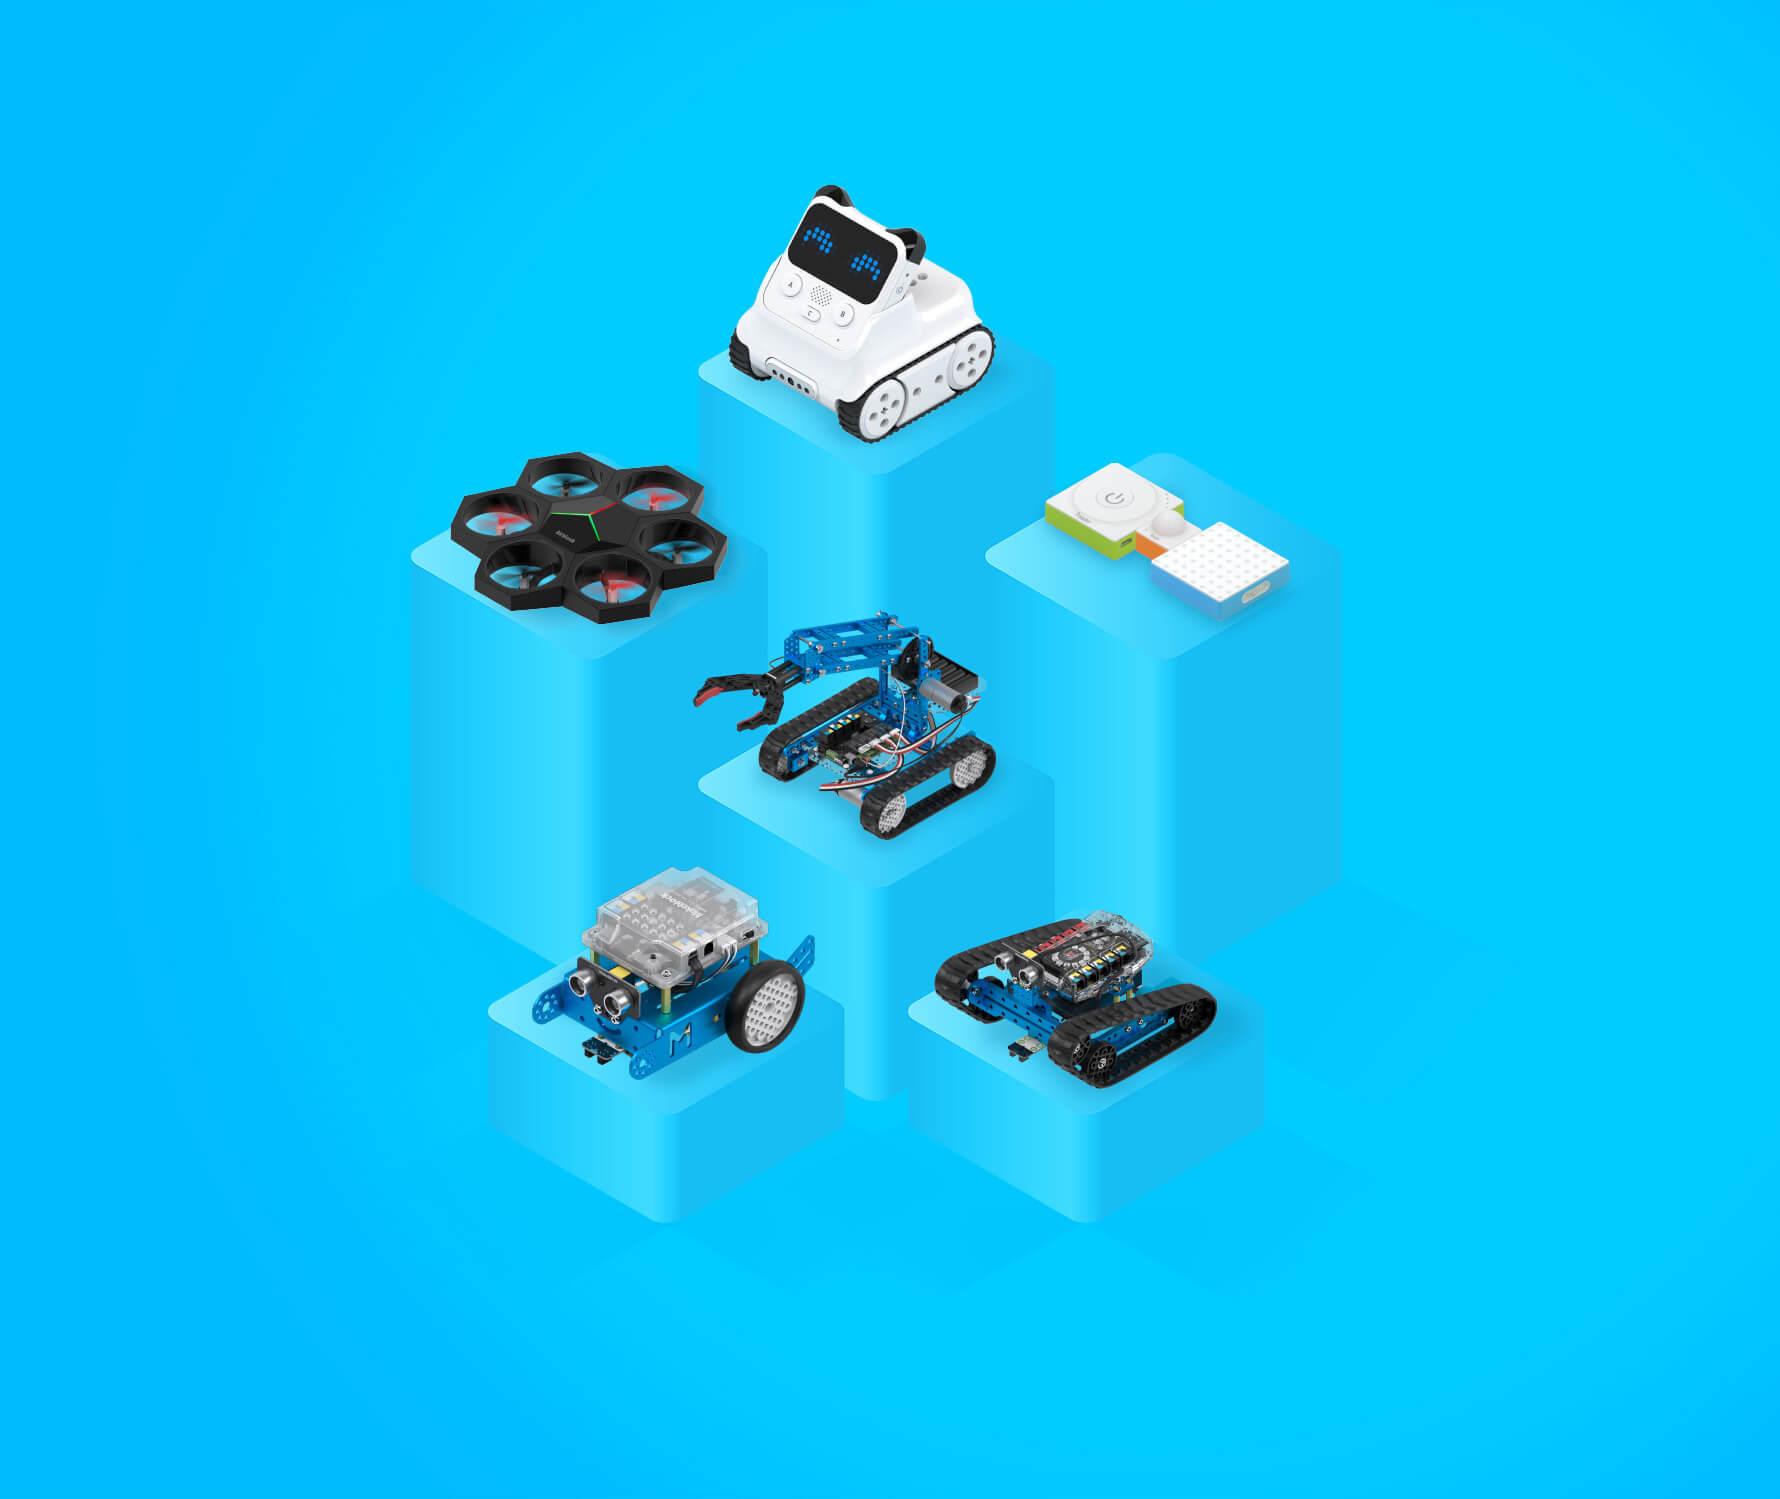 Makeblock Global Steam Education Solution Provider 12 Lead Motor Star Delta Wiring Diagram Kits